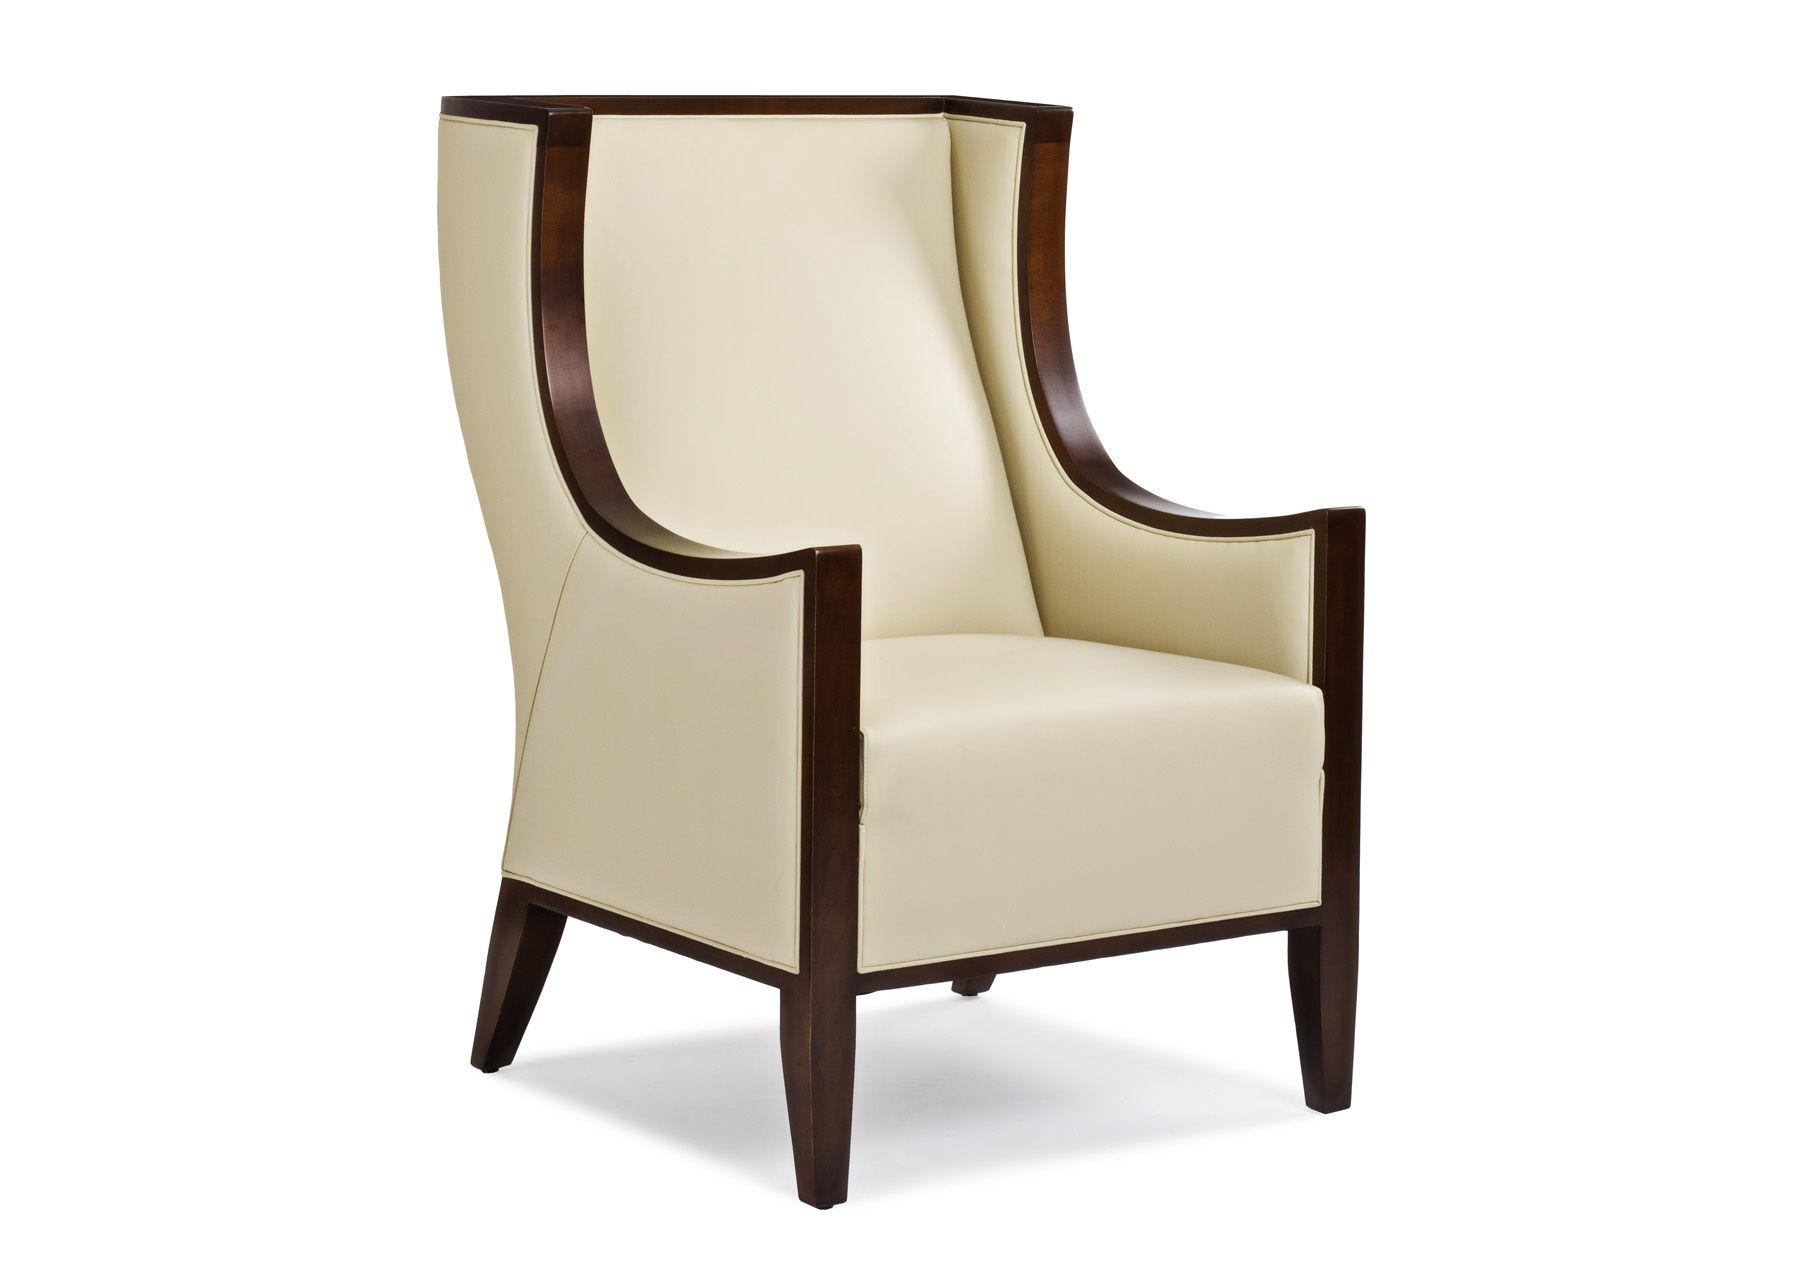 Luxe Ii By Cabot Wrenn 5432 Luxe Ii Chair H42 25 W28 5 D30